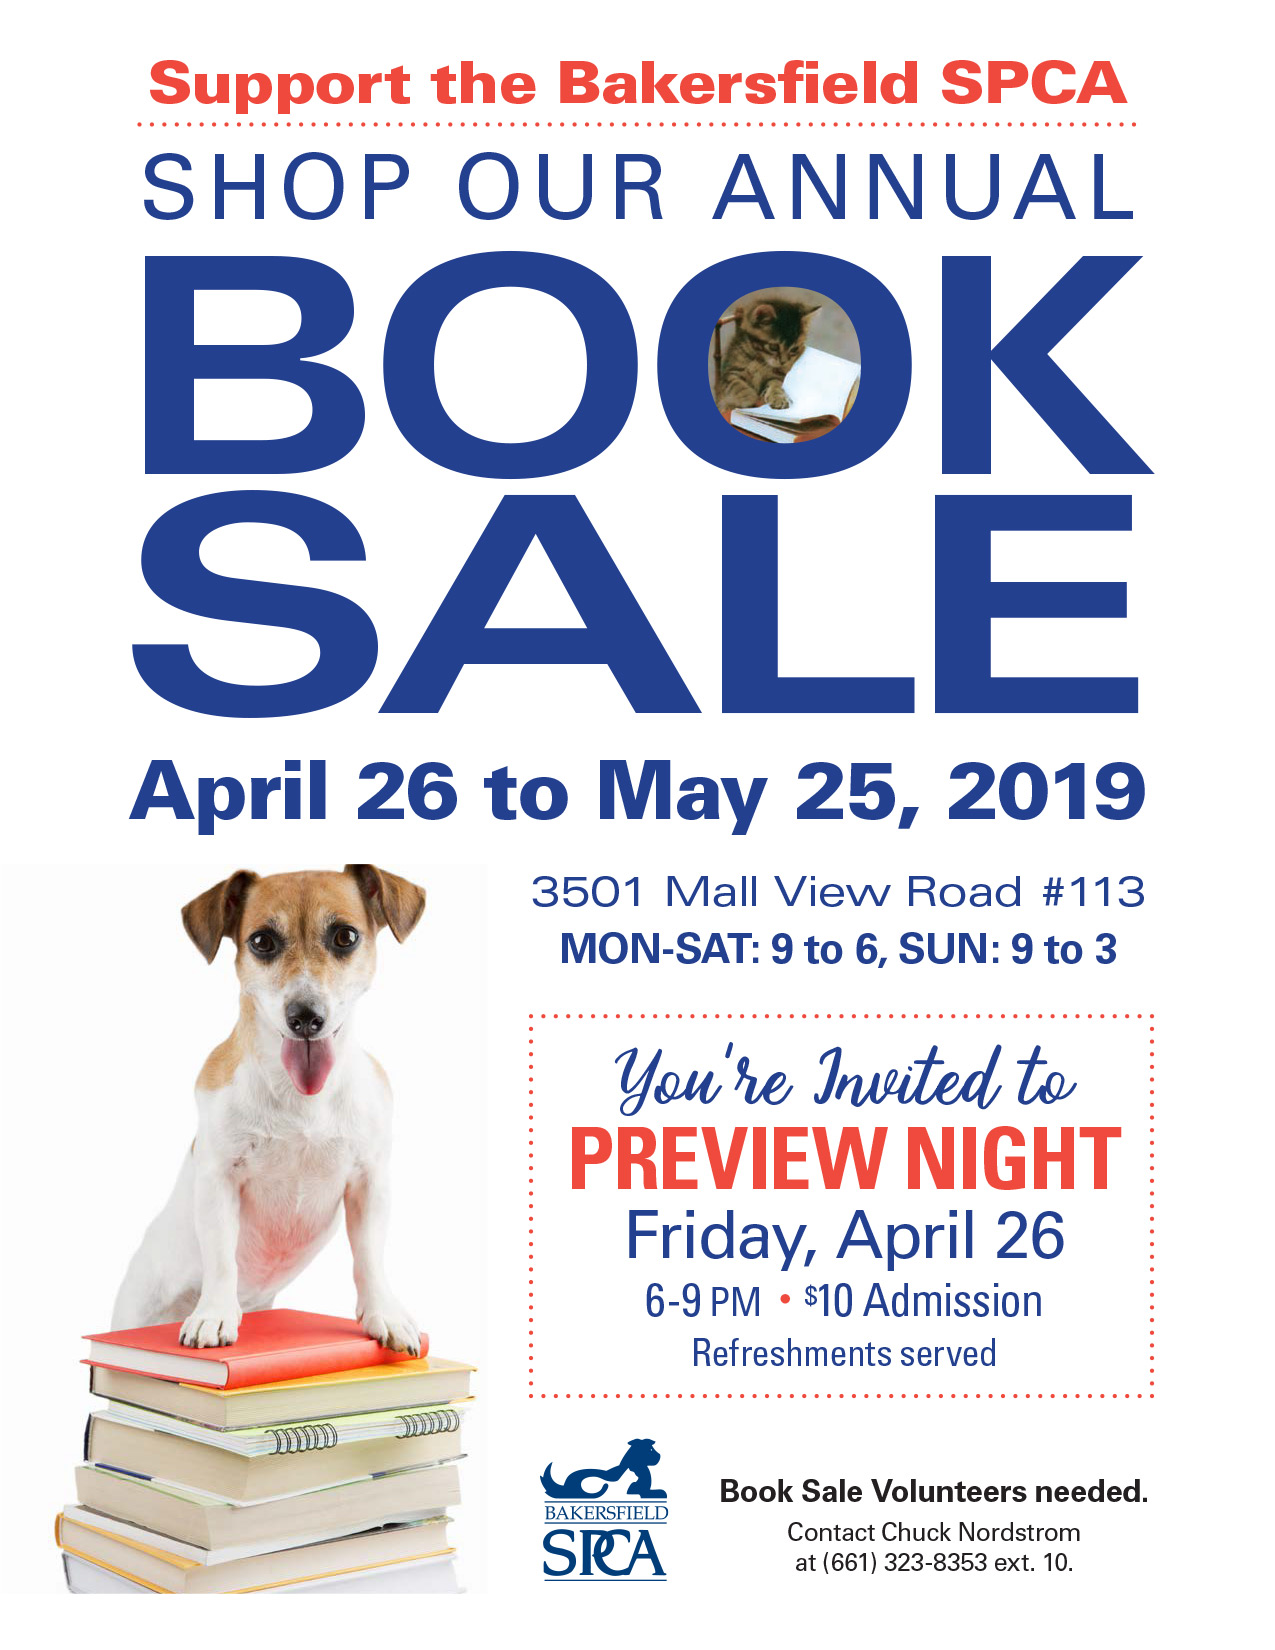 Bakersfield SPCA Book Sale